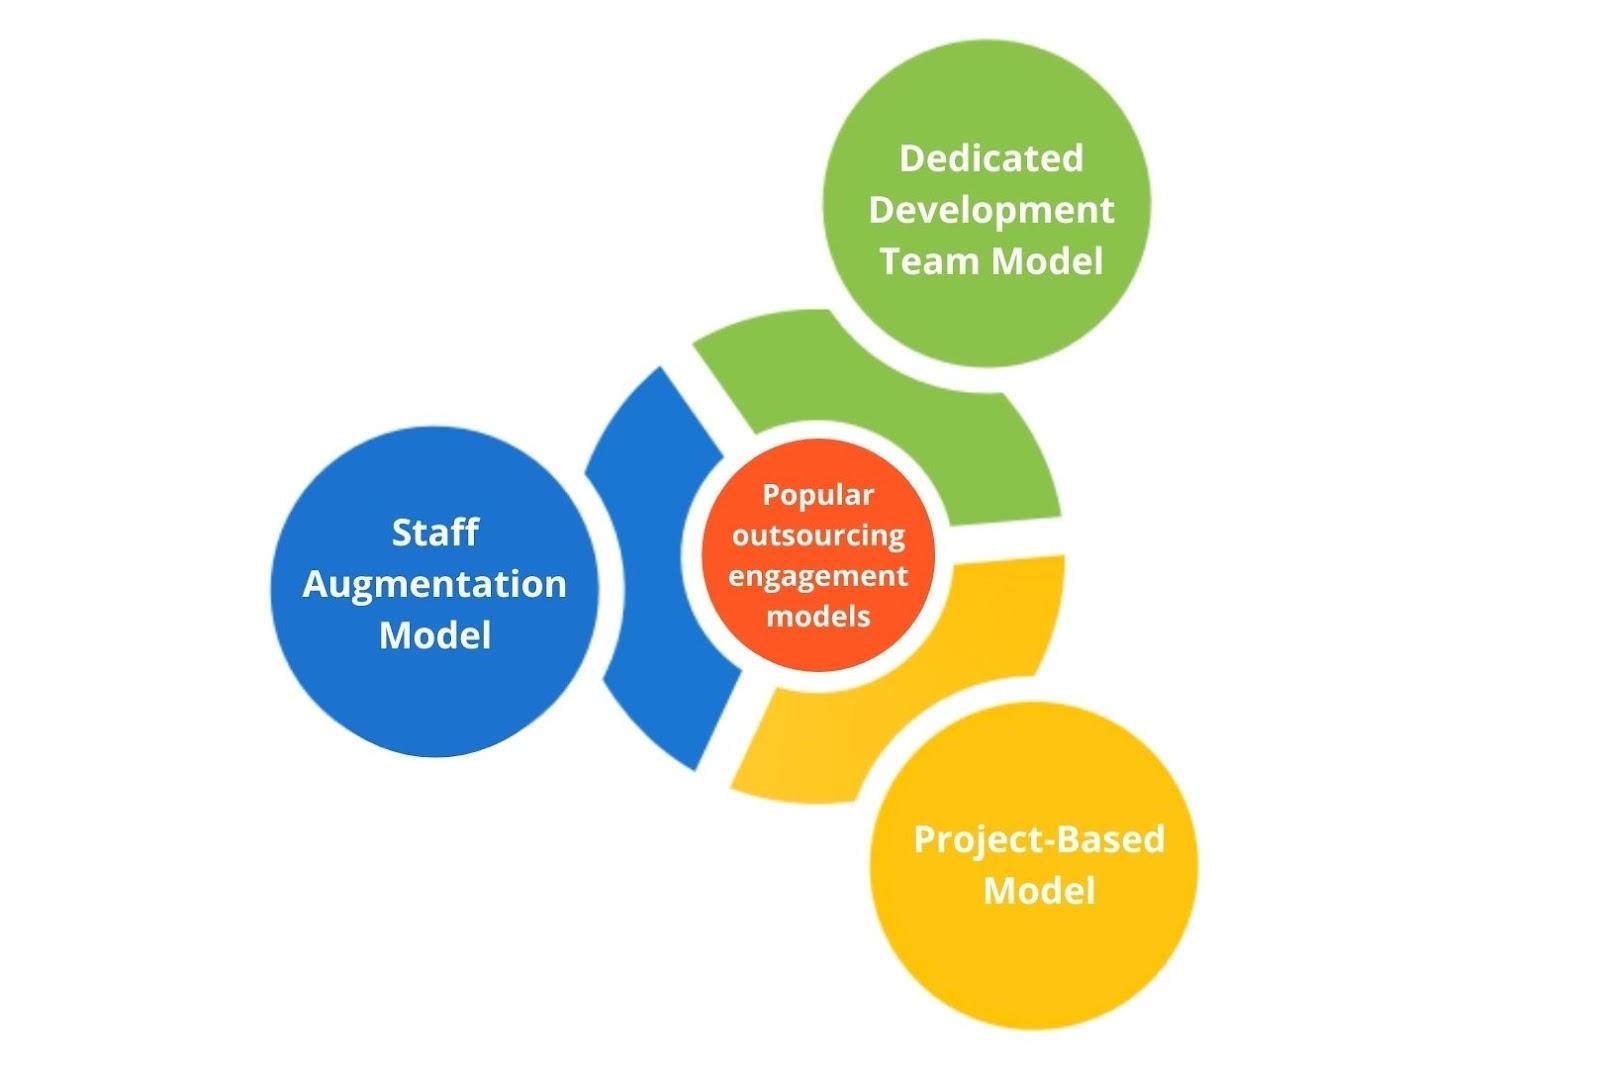 Popular outsourcing engagement models